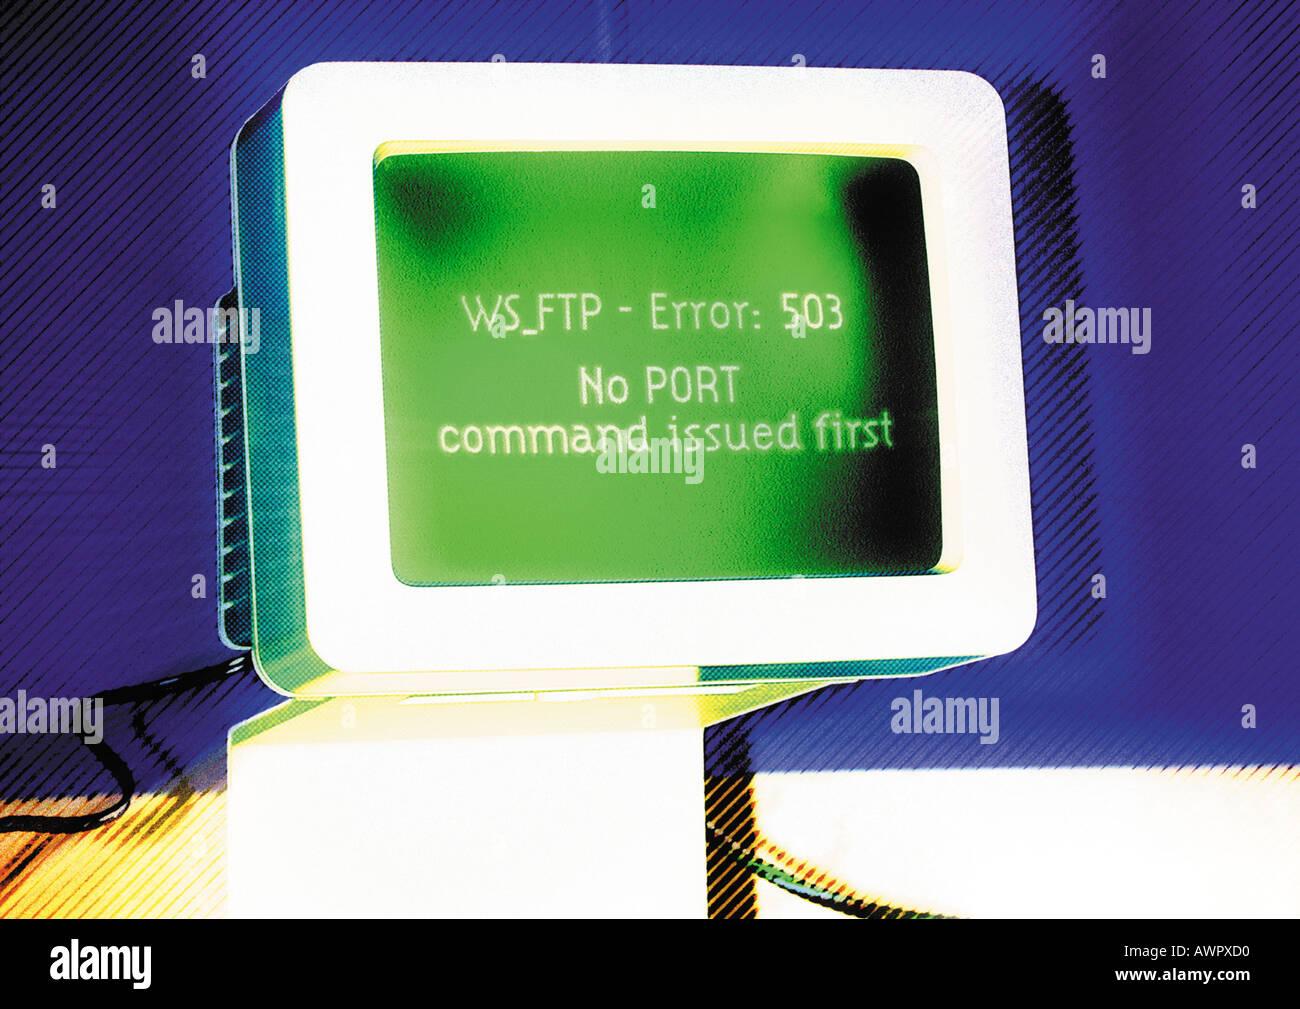 Computer, Fehlermeldung auf dem Bildschirm, digital Composite. Stockbild